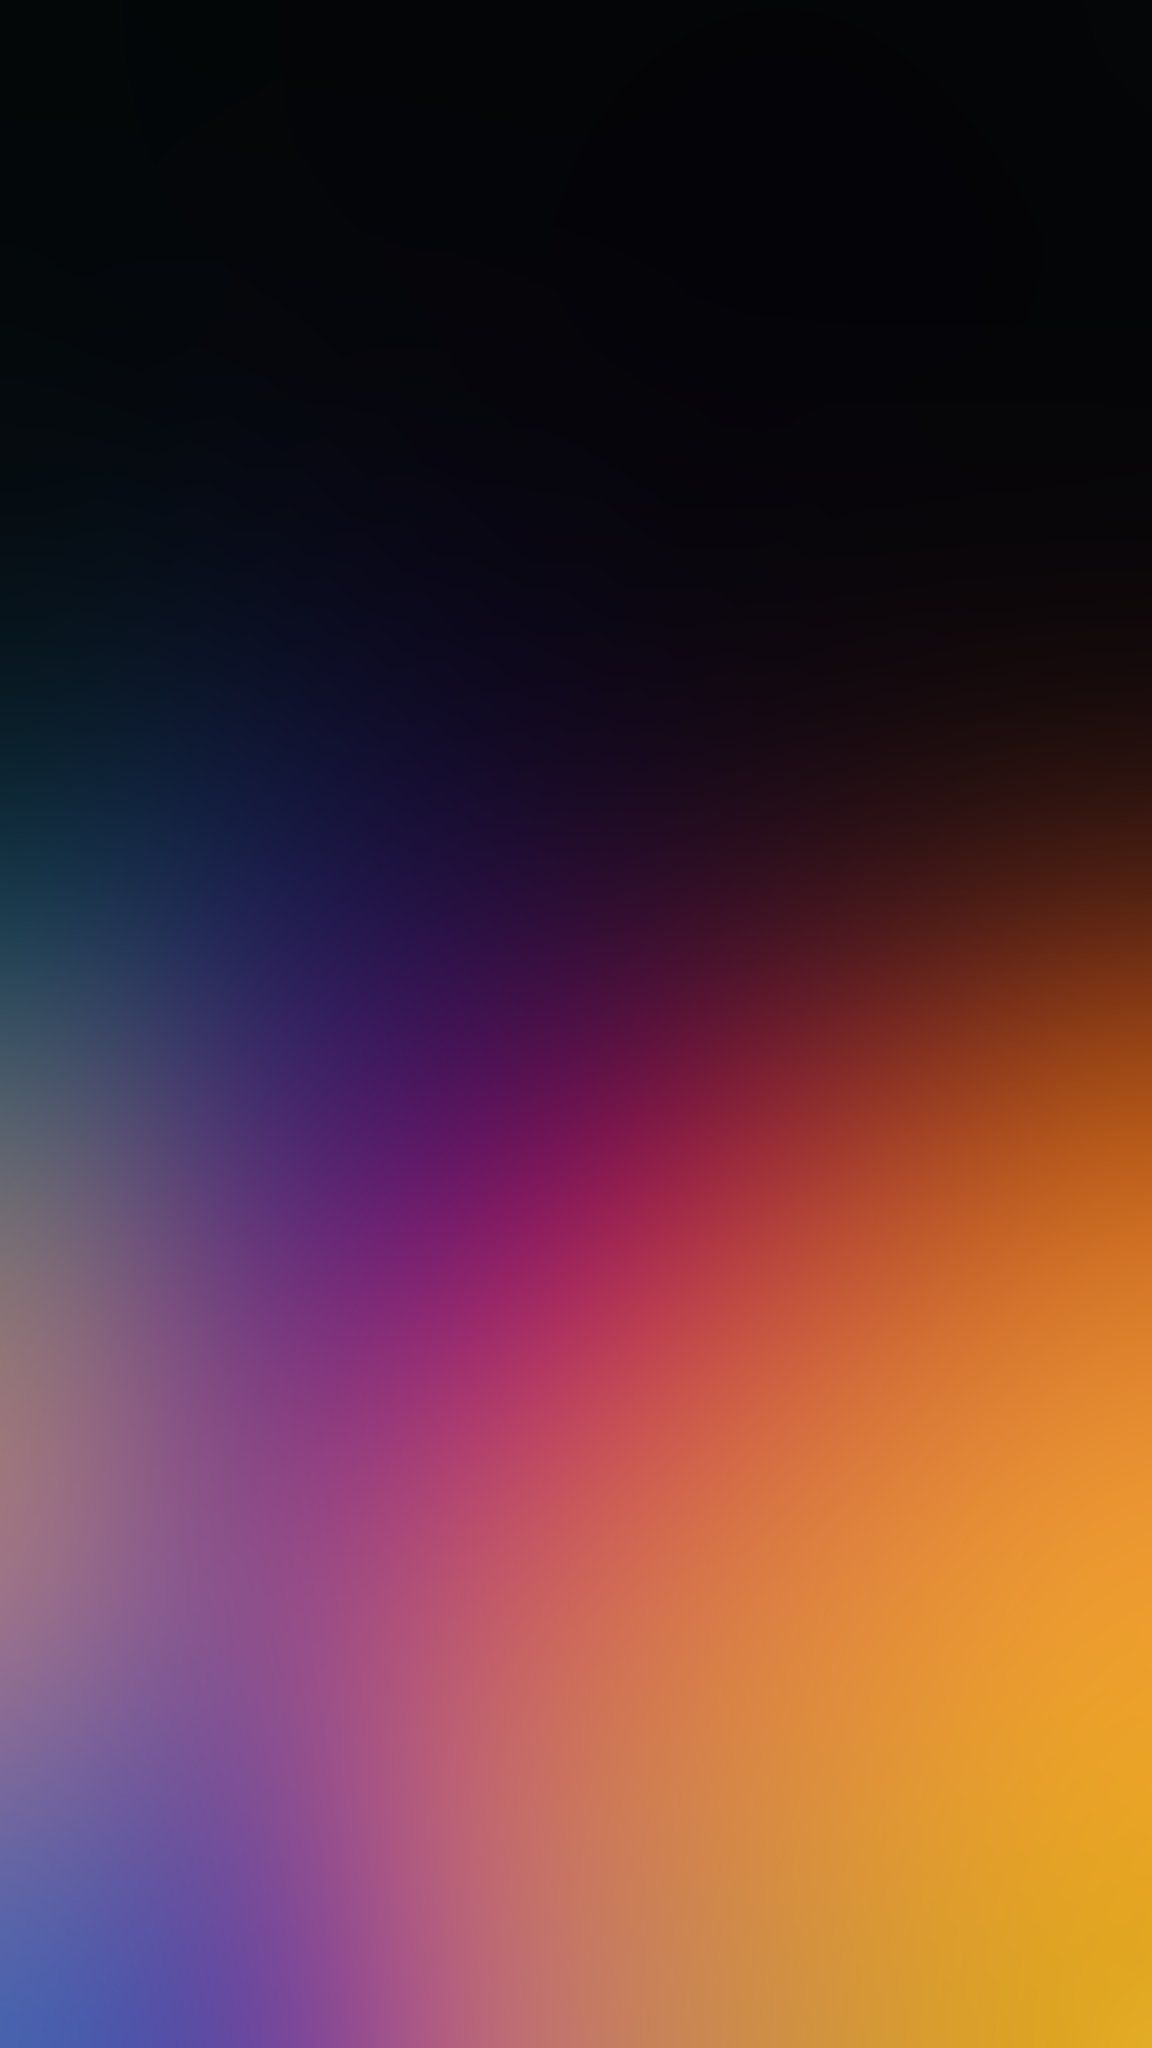 Iphonex Ios11 Ios12 Lockscreen Homescreen Backgrounds Apple